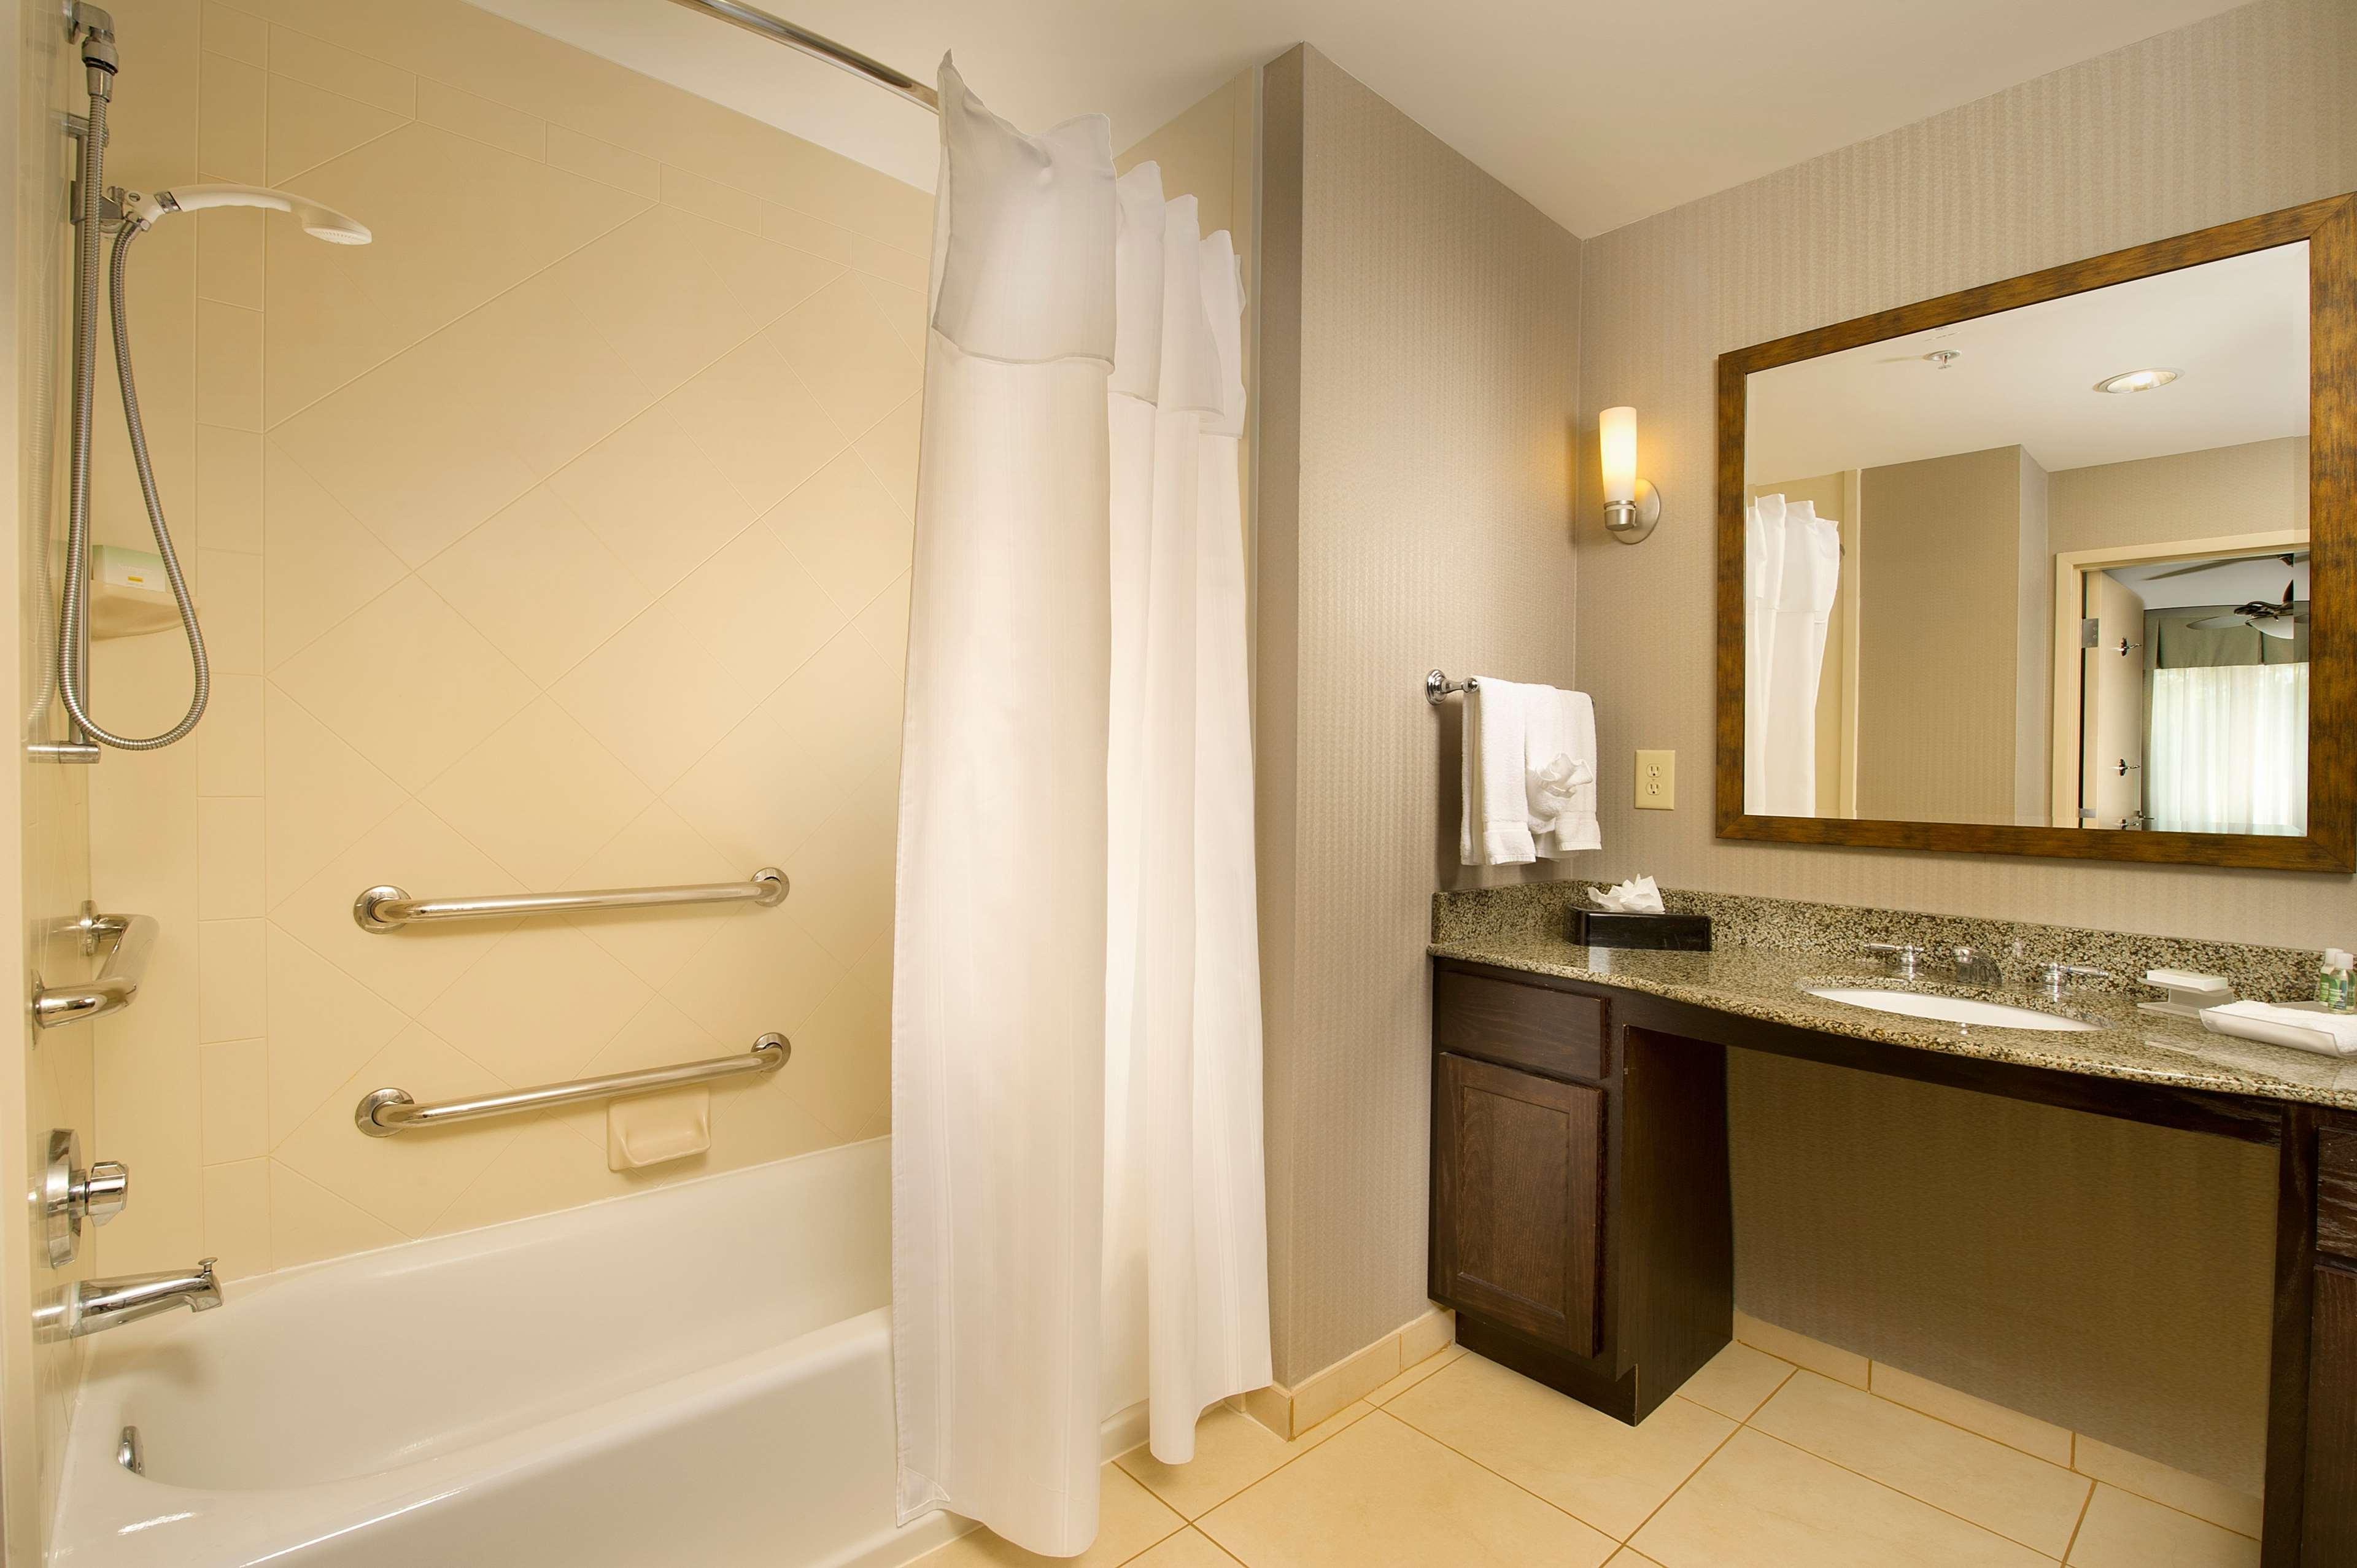 Homewood Suites by Hilton Columbus image 16